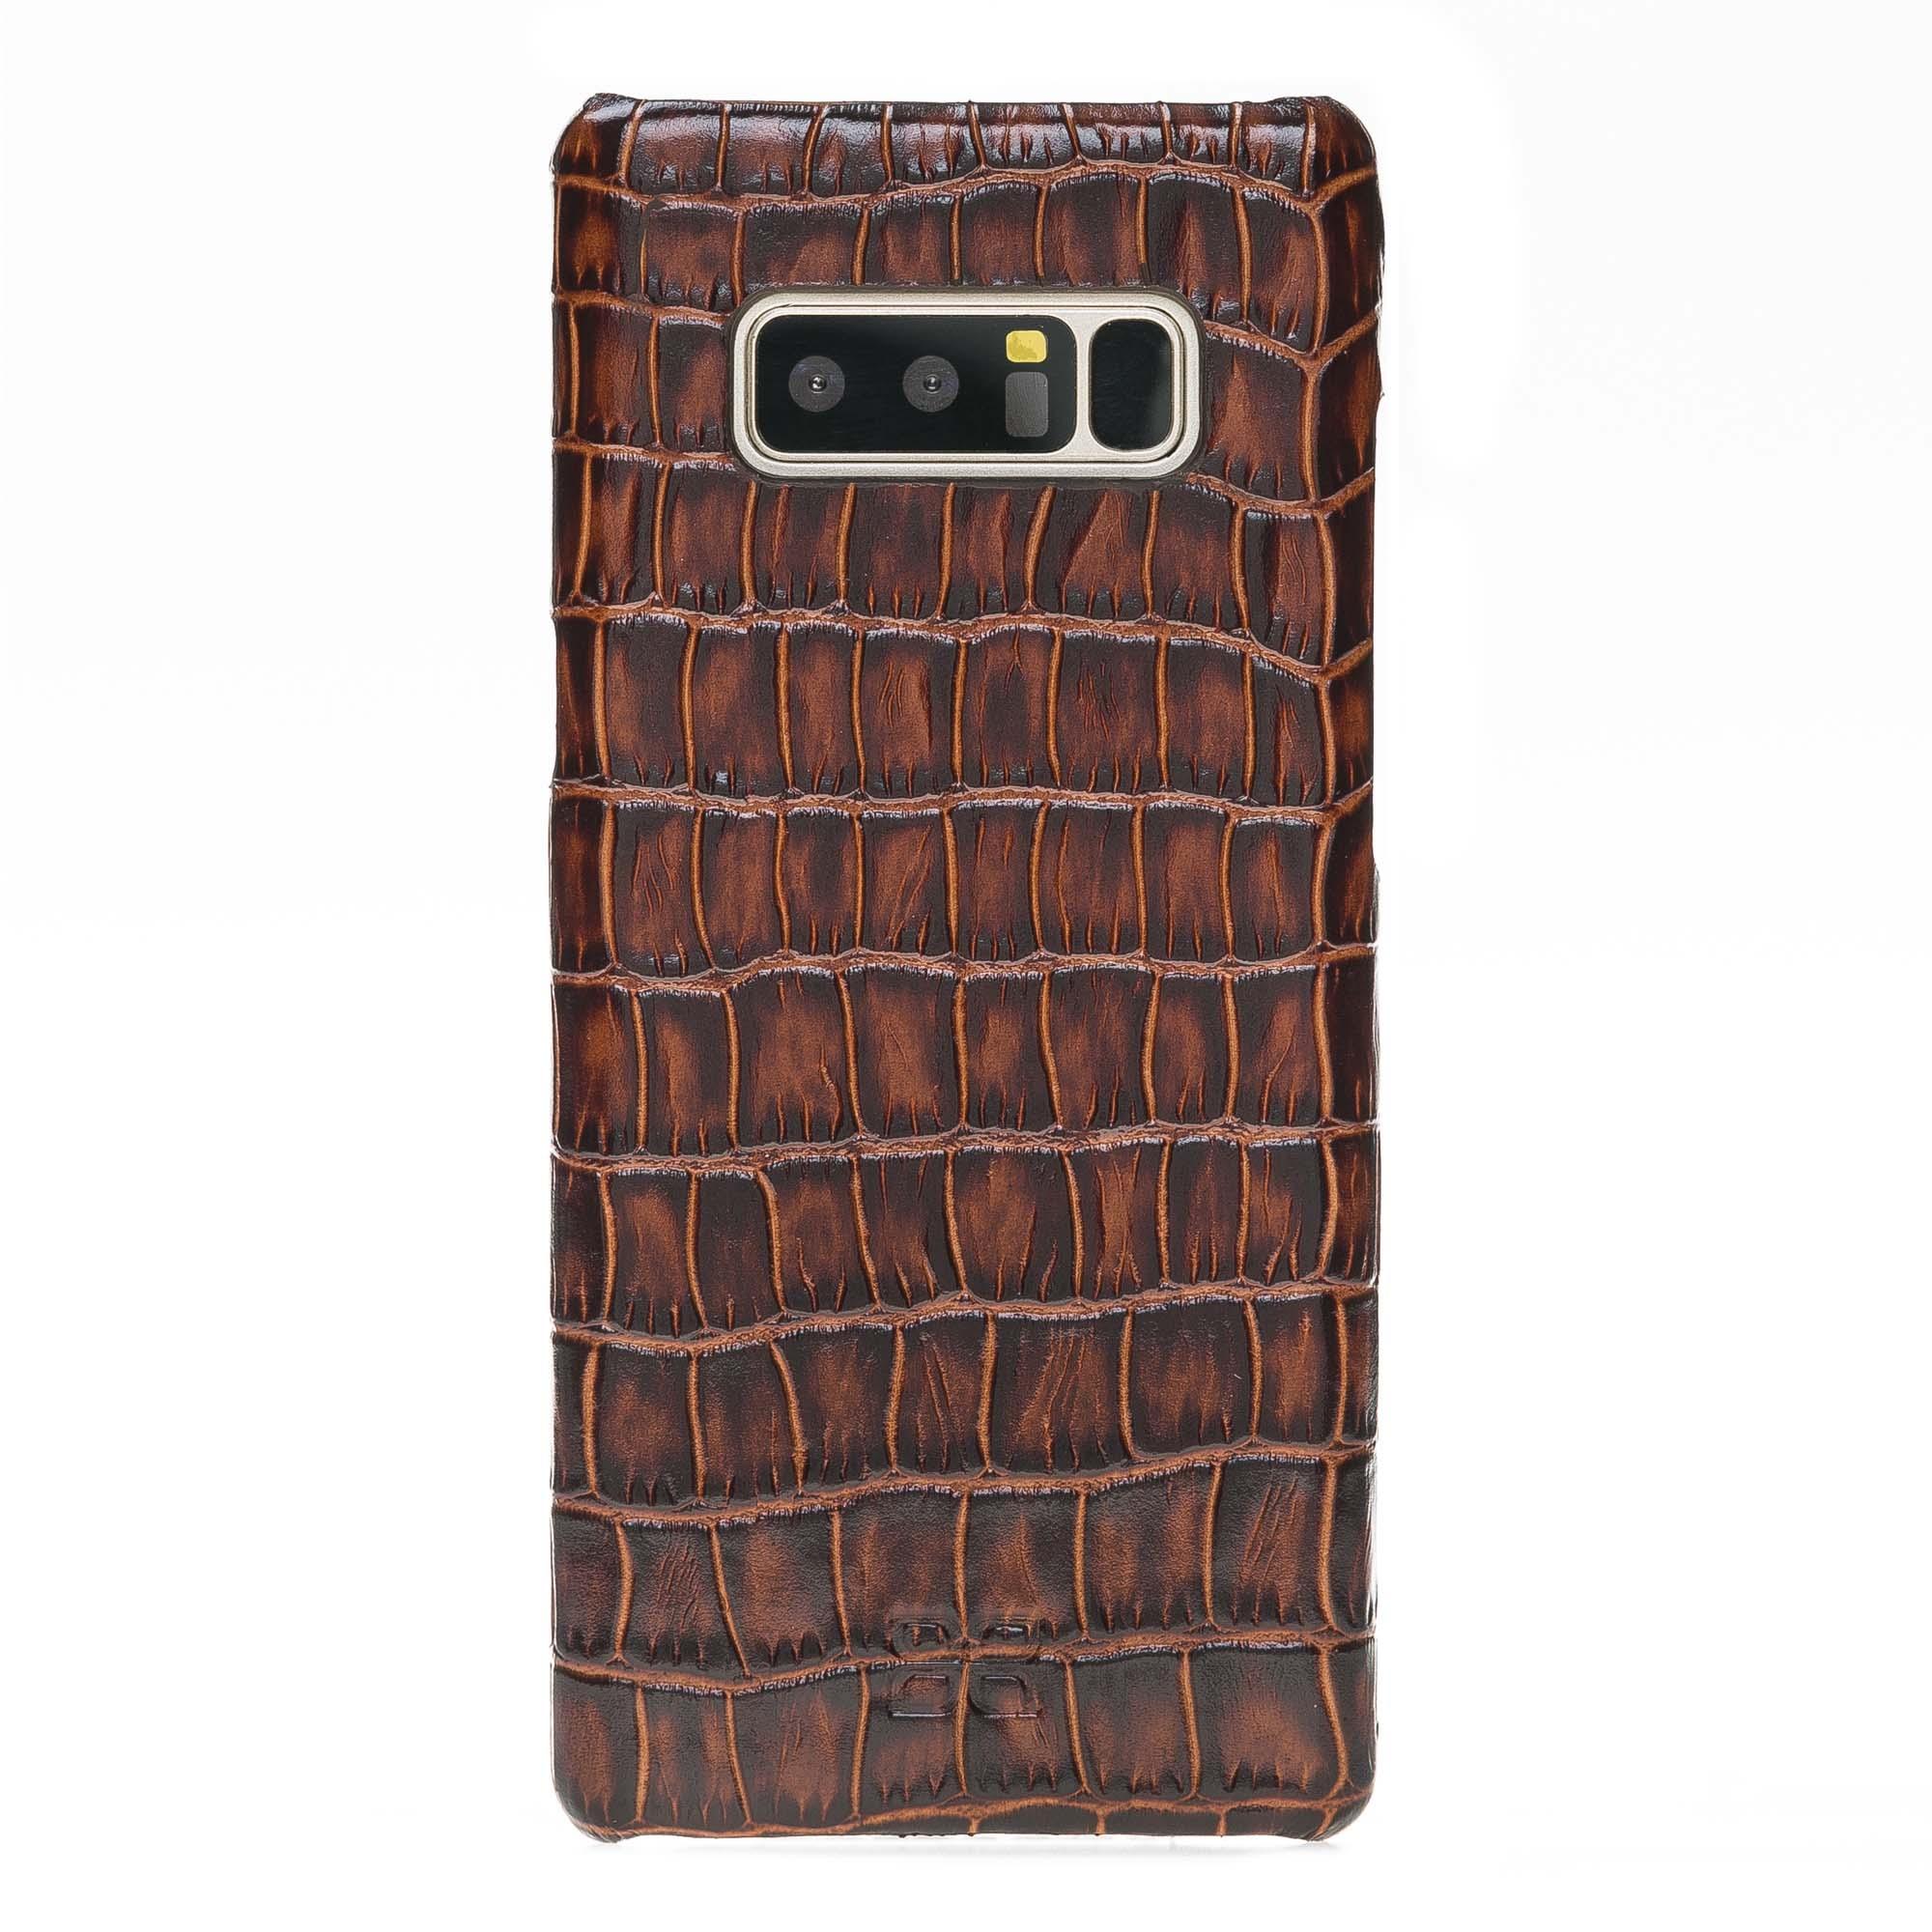 Чехол Ultimate Jacket Bouletta Коричневый YK06 для Samsung Galaxy note 8